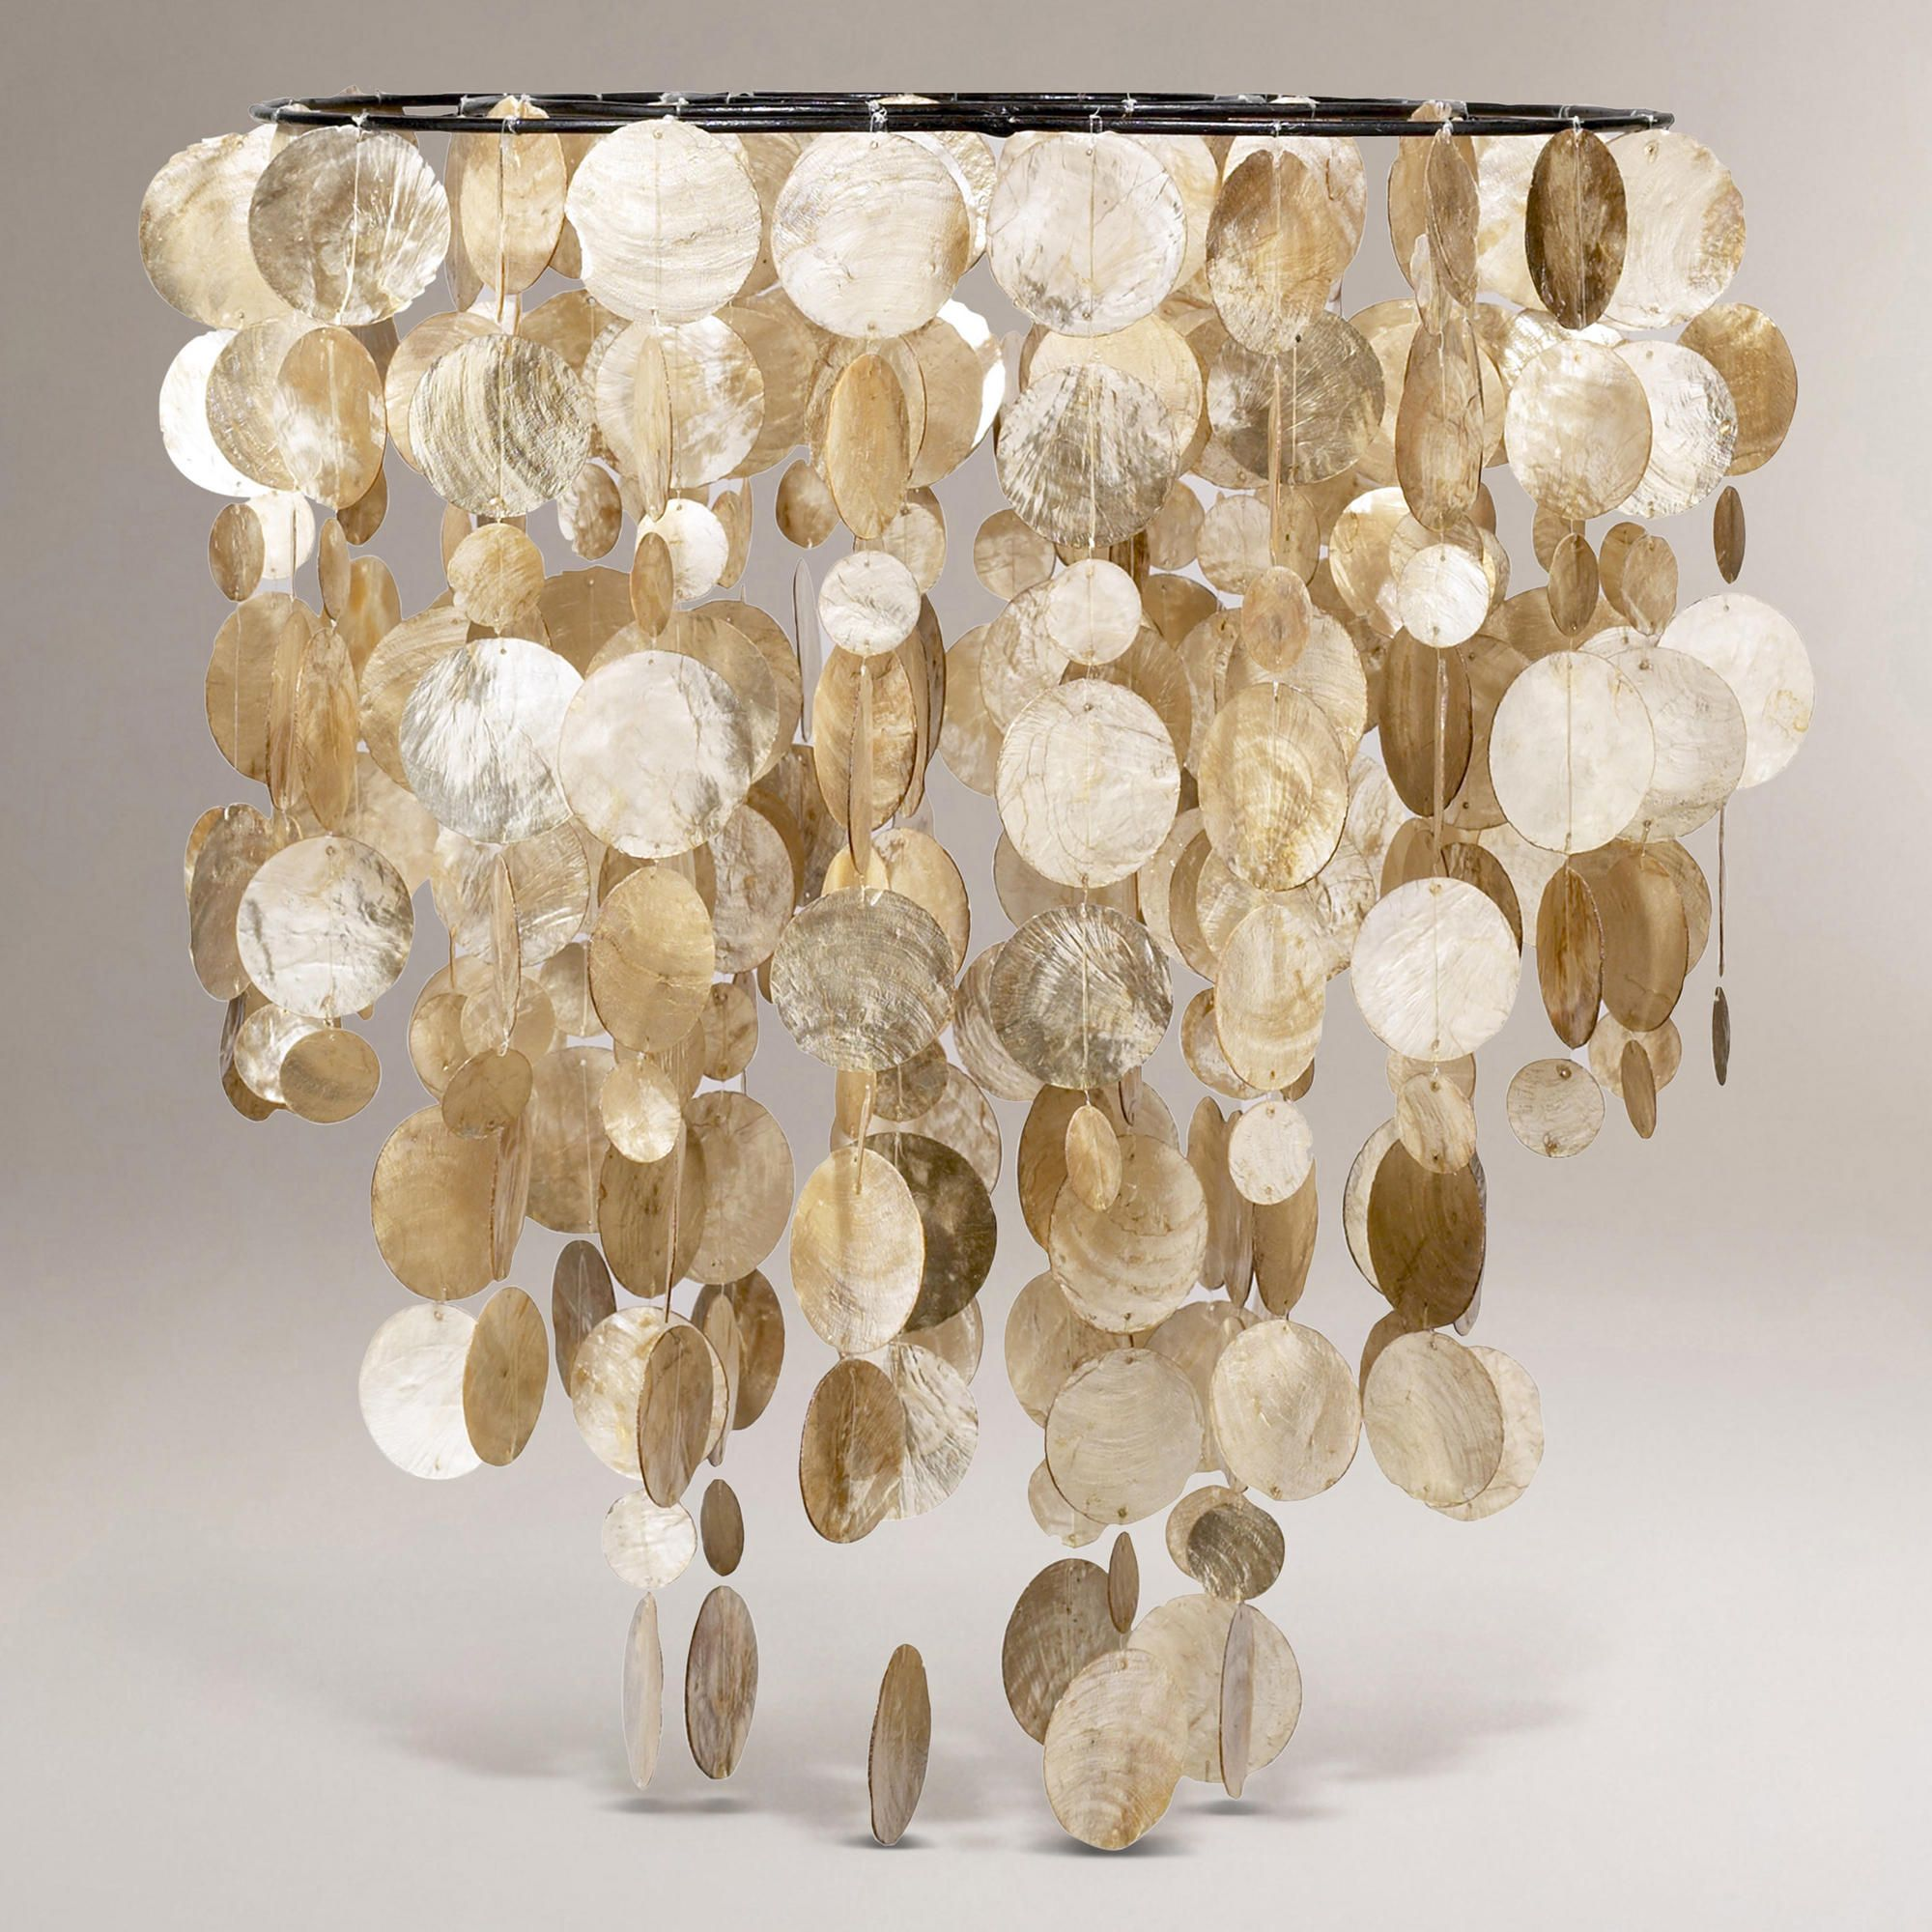 Capiz pendant shade pendants lights and kitchens capiz pendant shade aloadofball Gallery